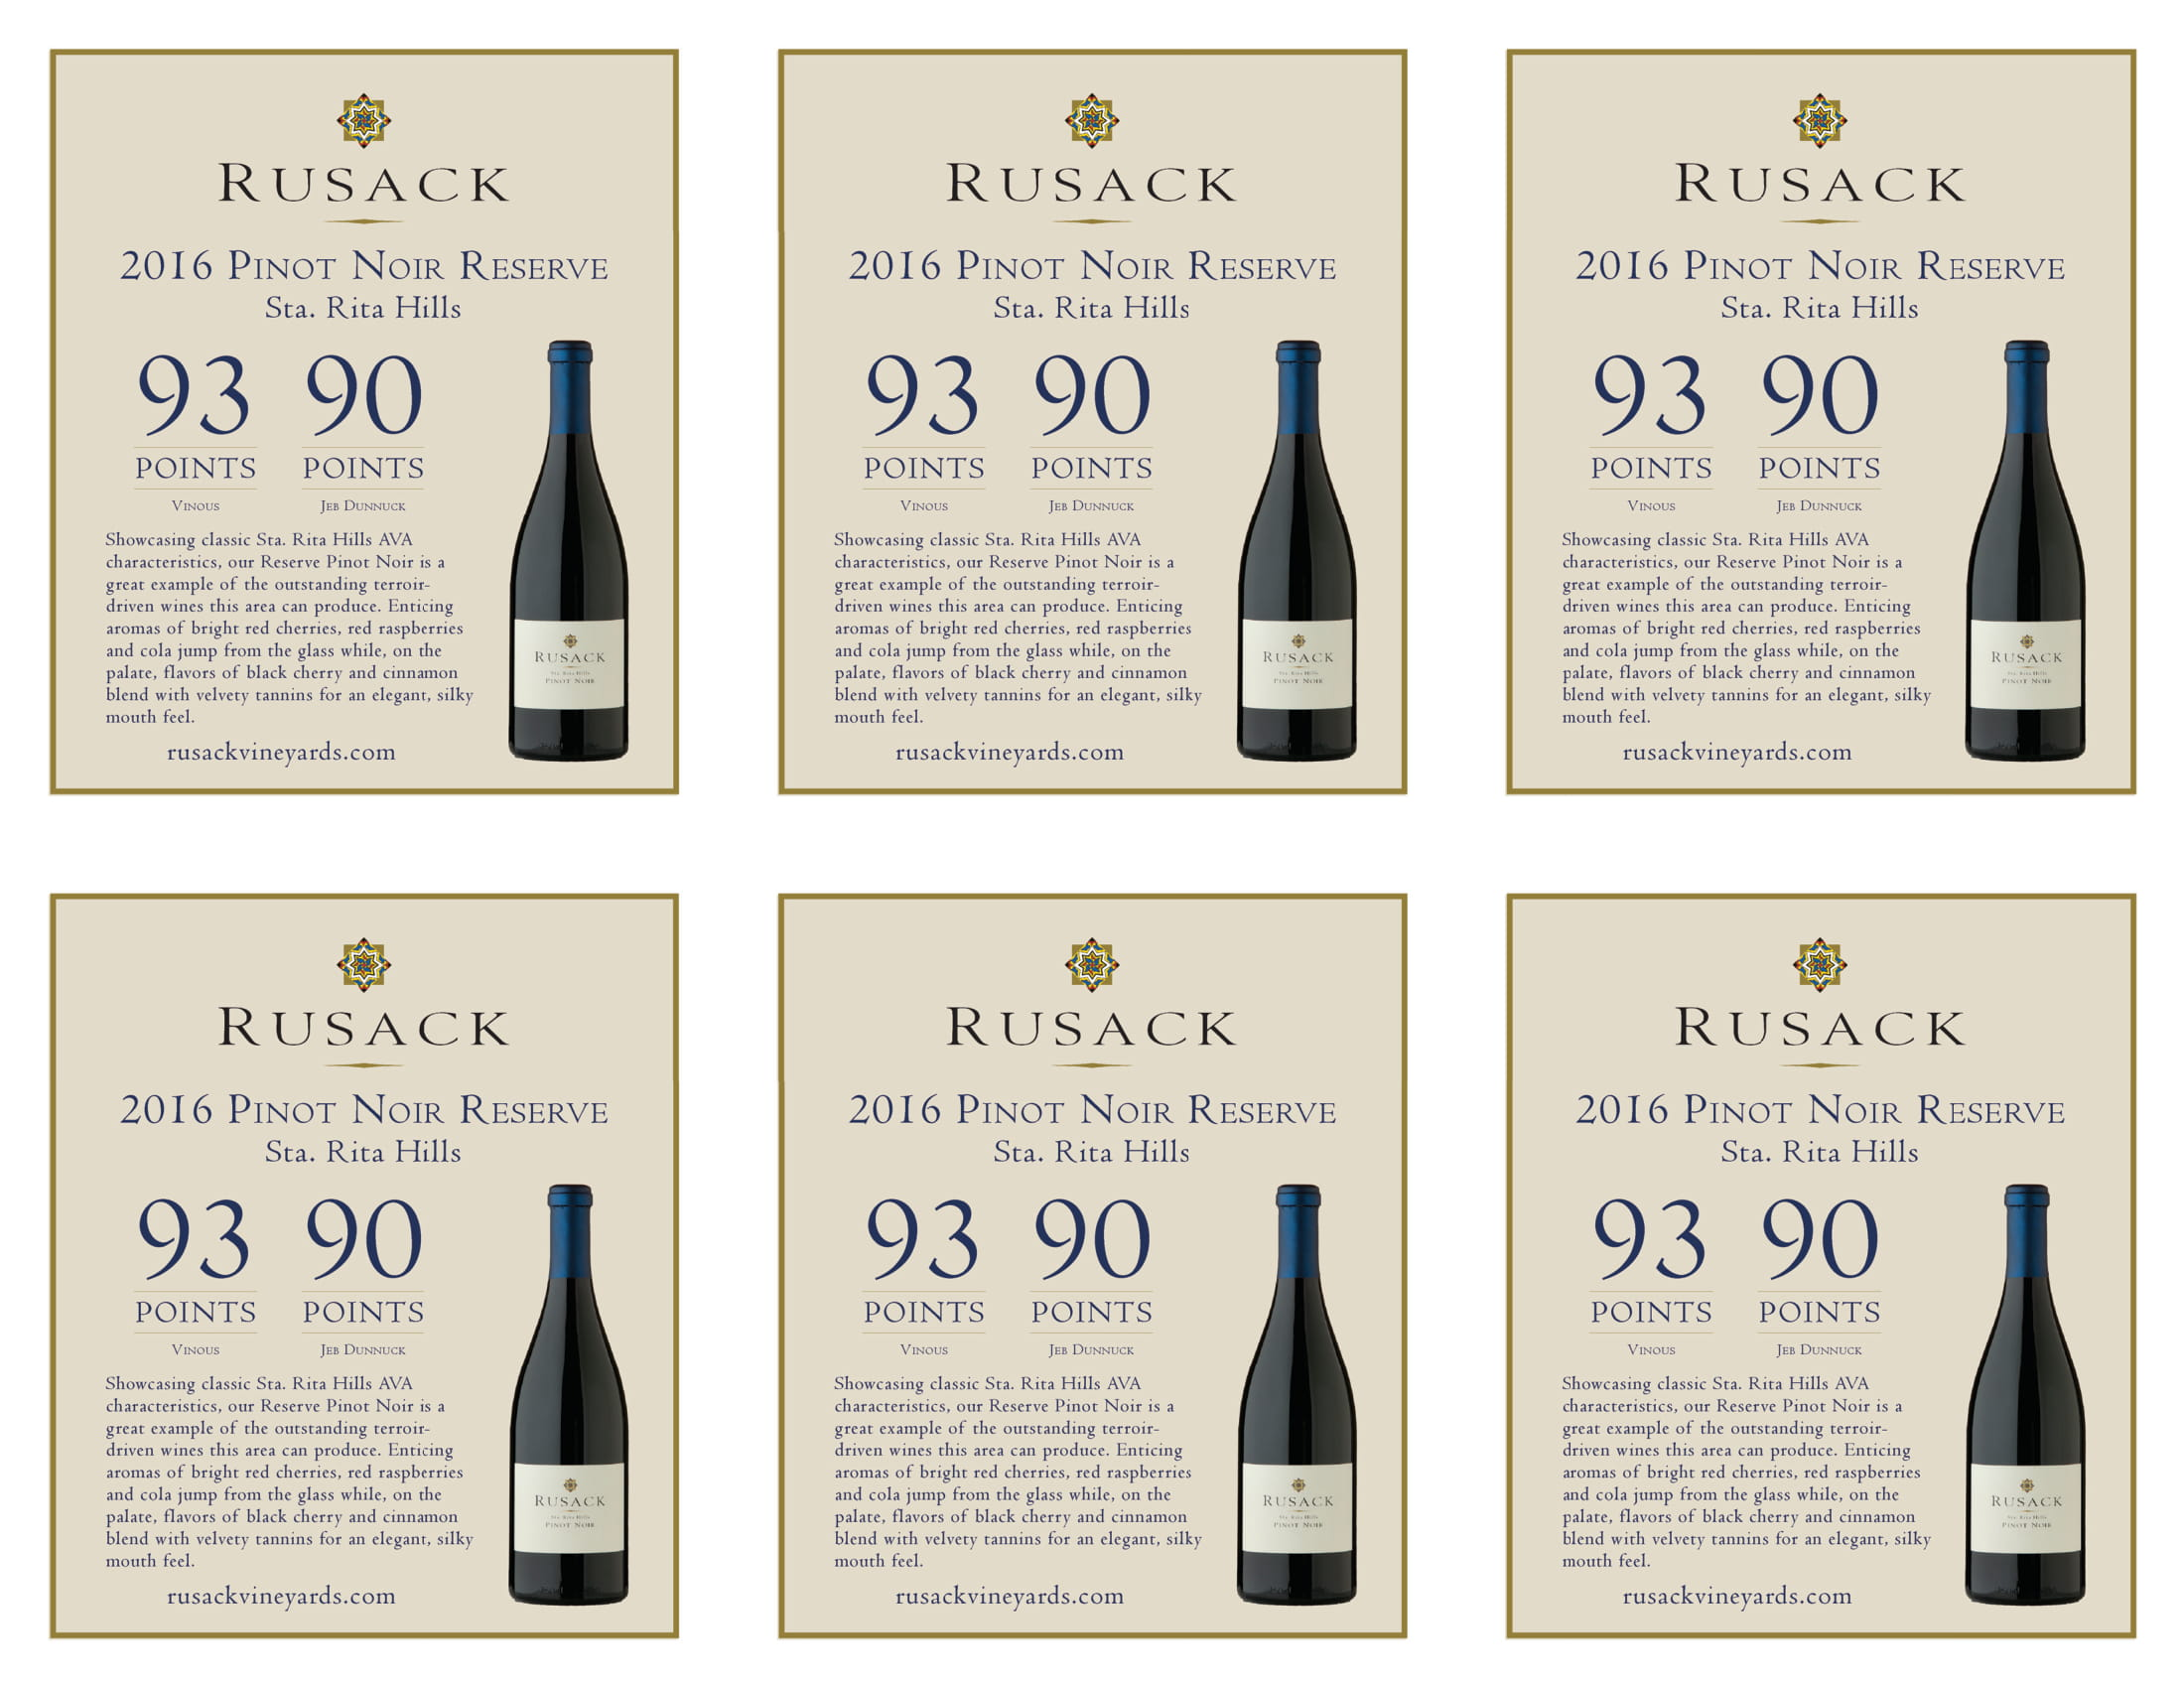 Rusack Vineyards Pinot Noir Santa Rita Hills Reserve Shelf Talker